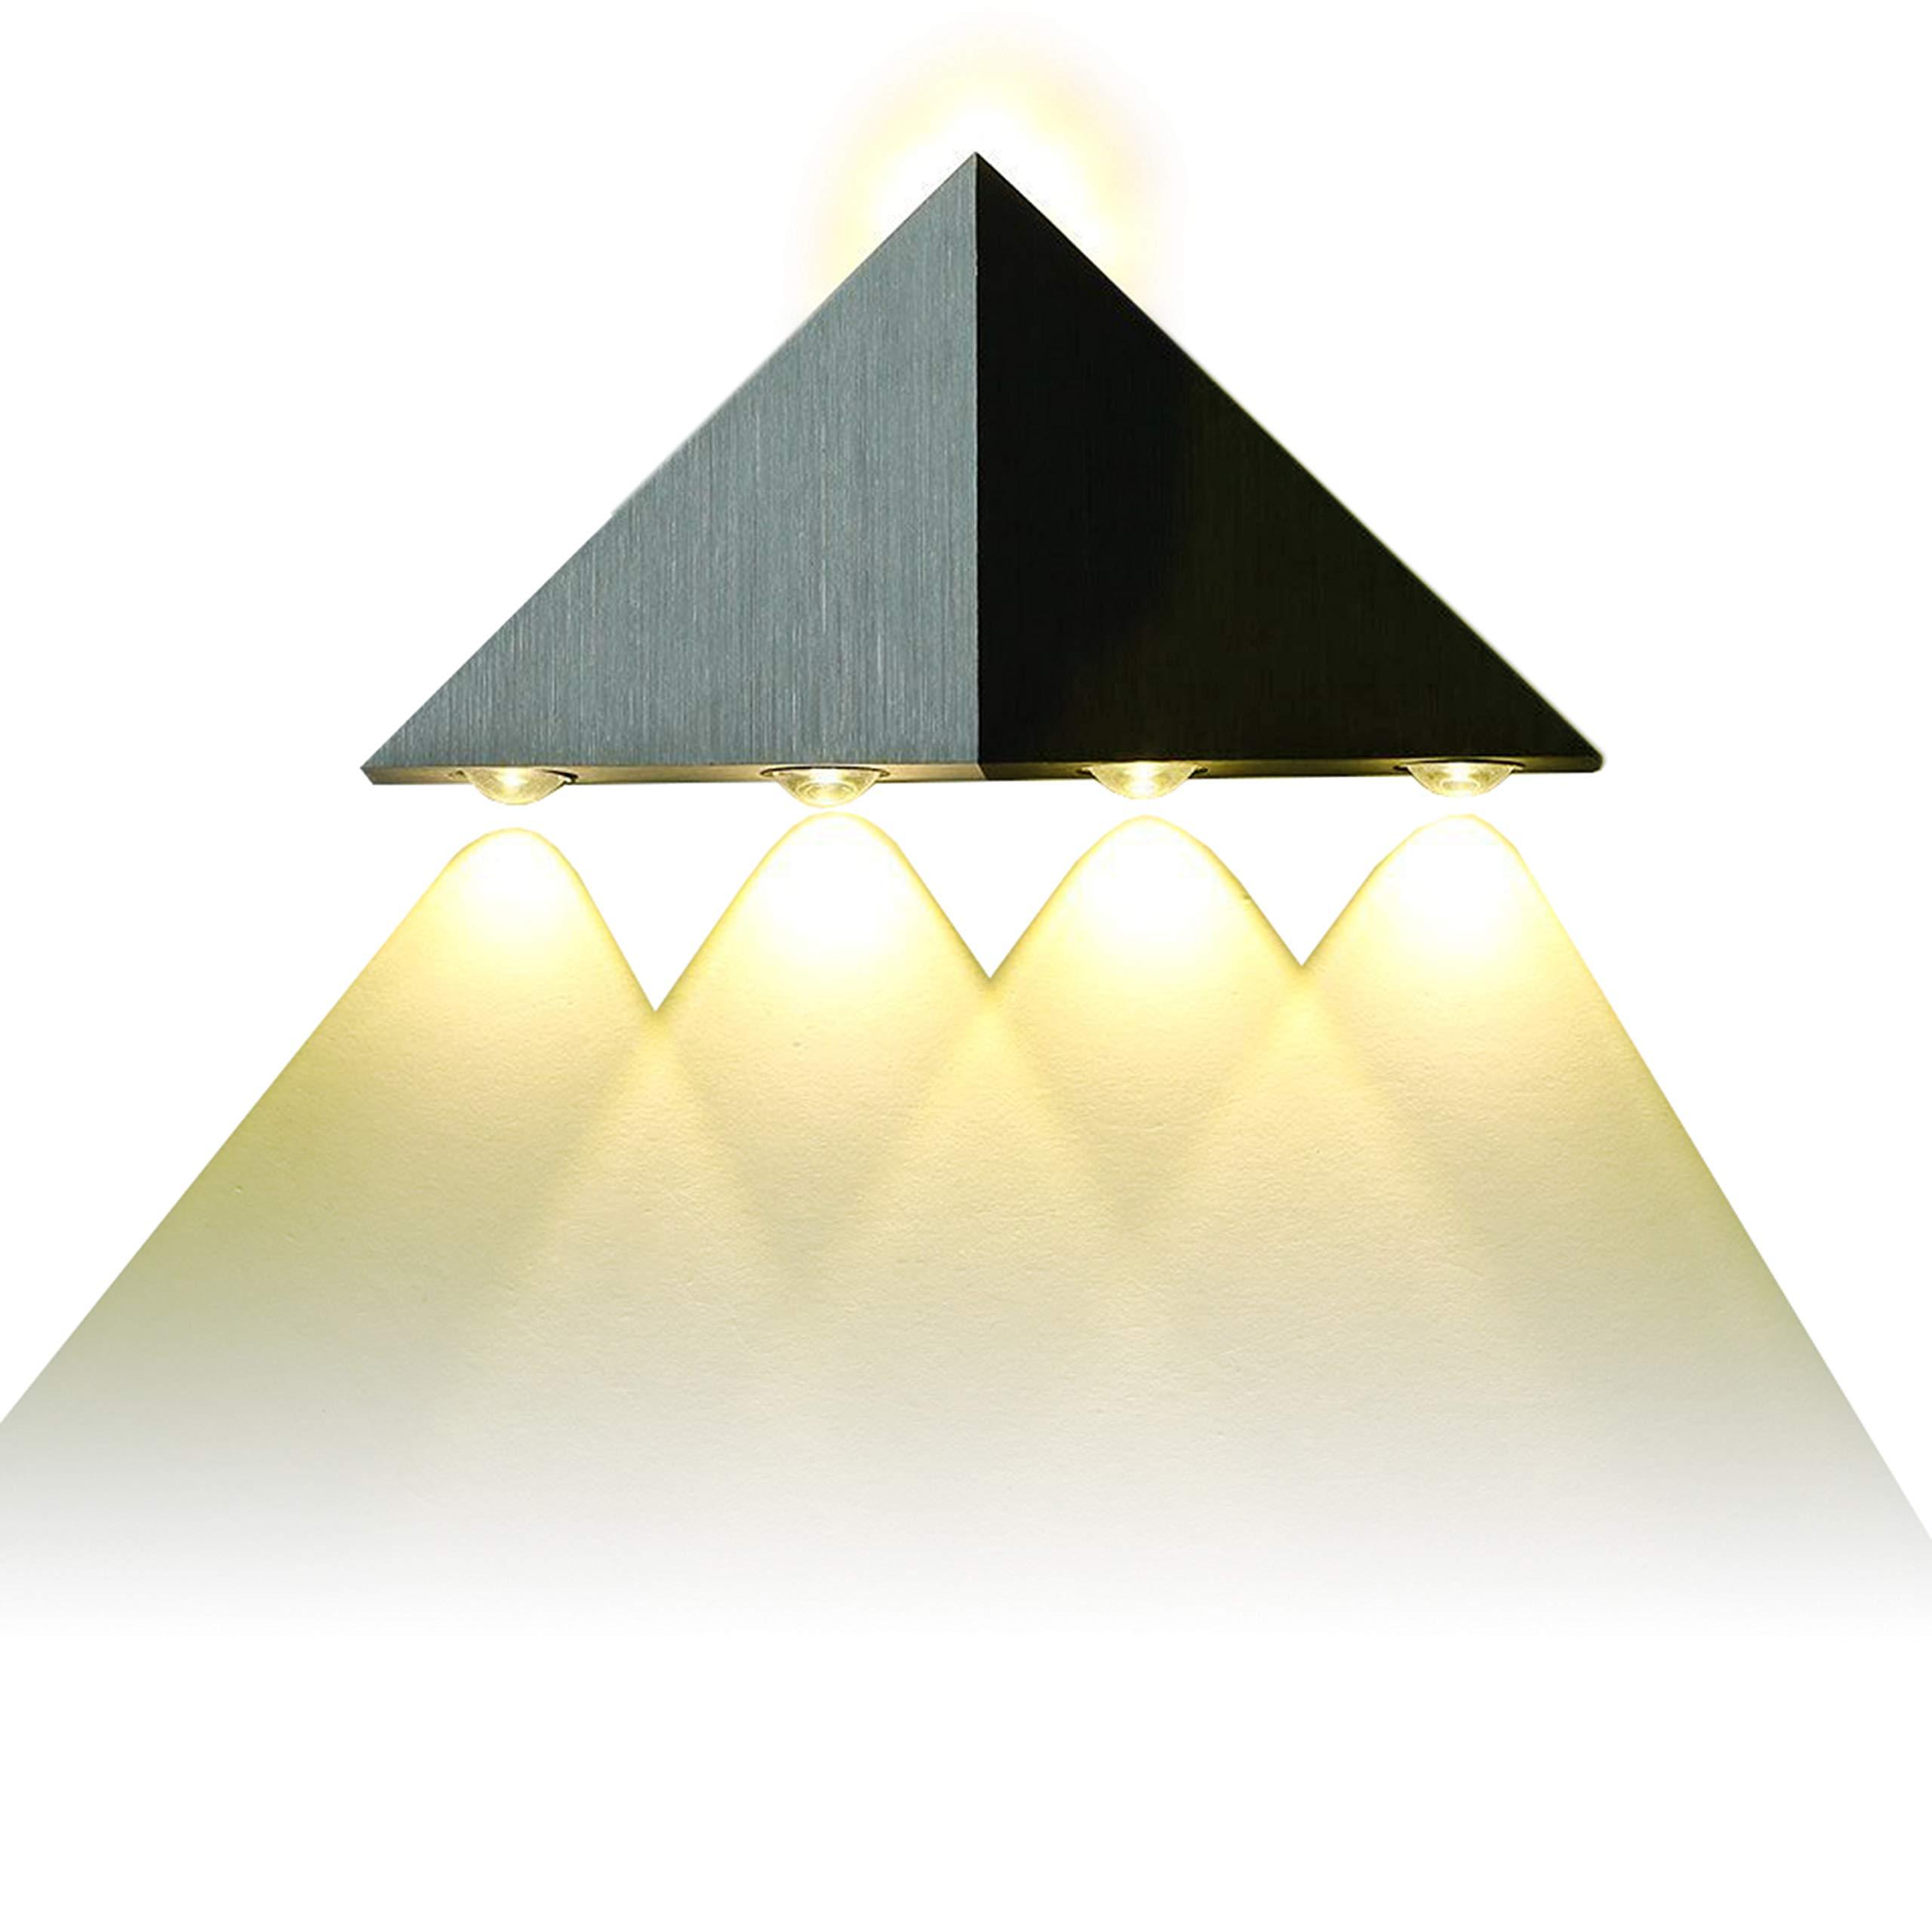 Decorative Bathroom Light: Amazon.com